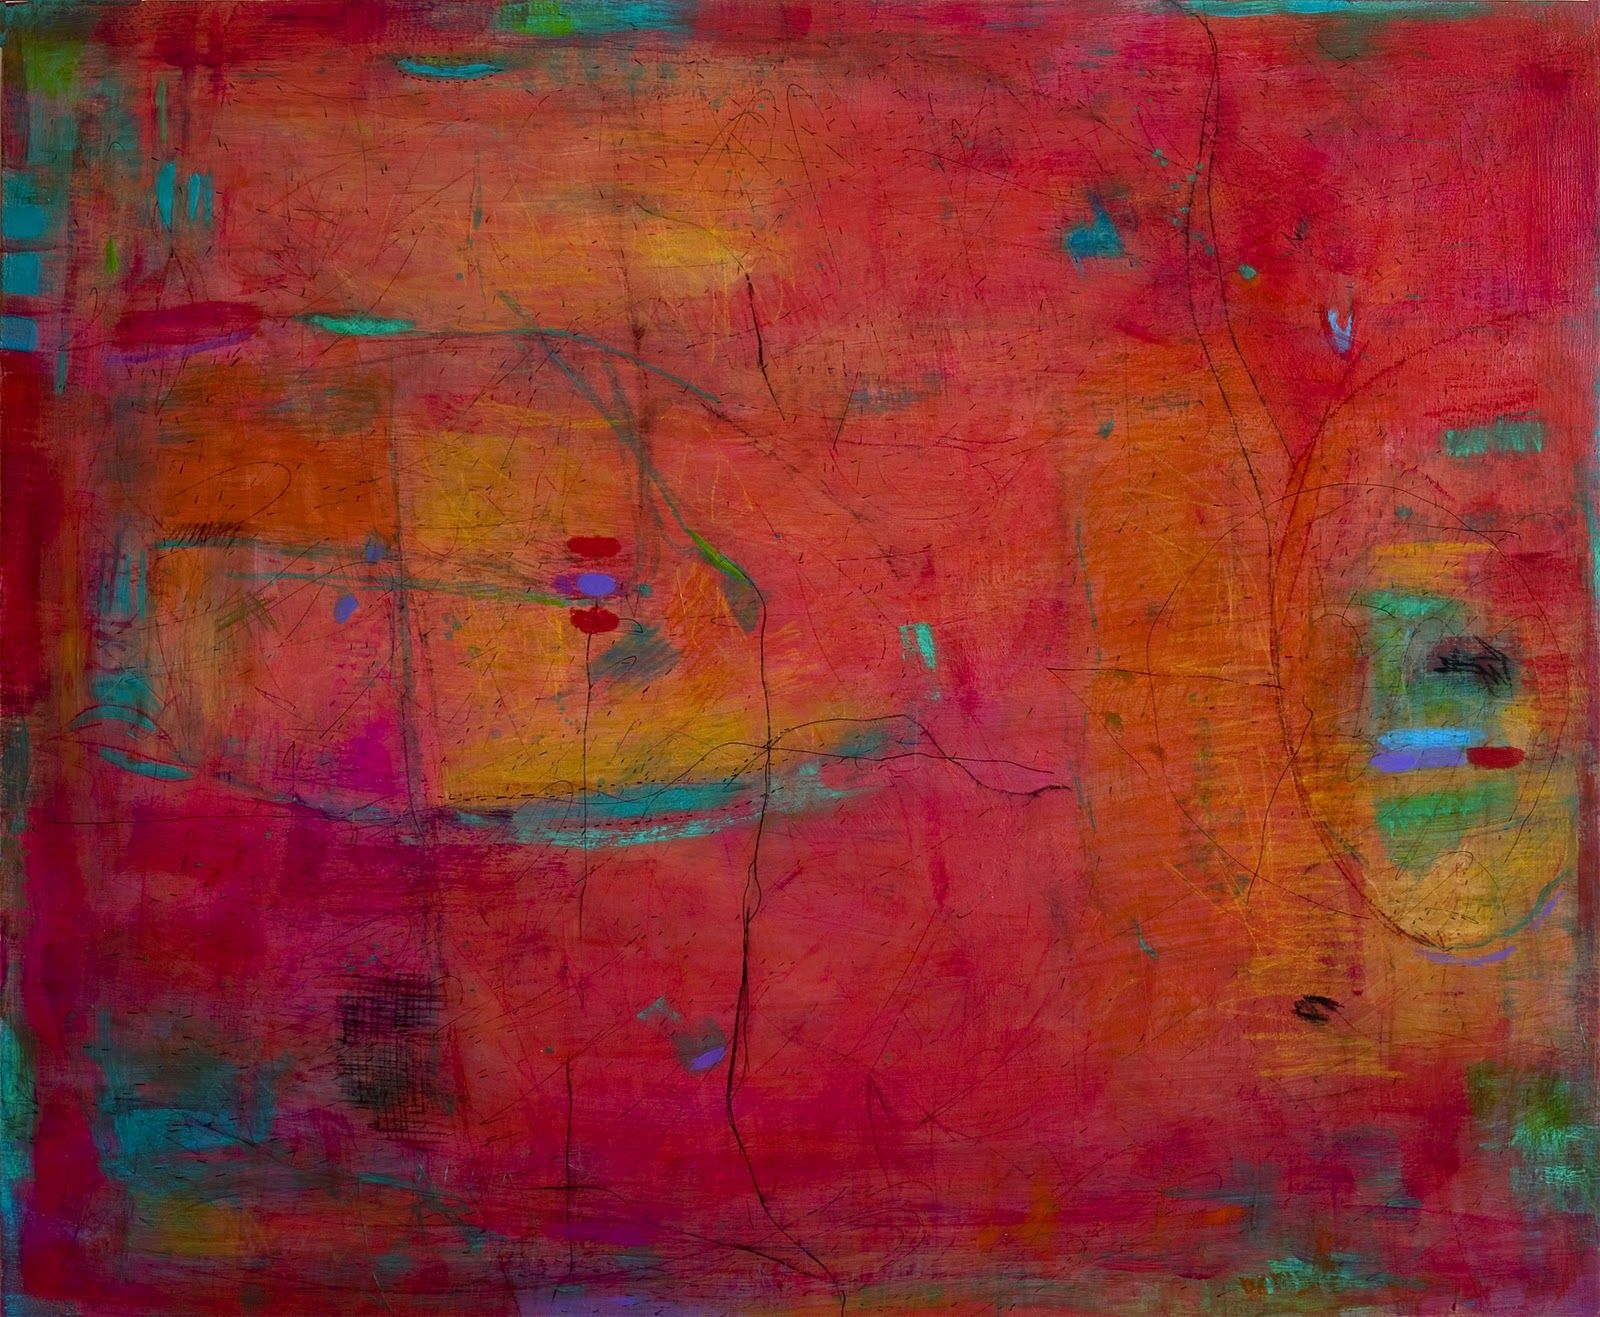 emilia arana art - Google Search